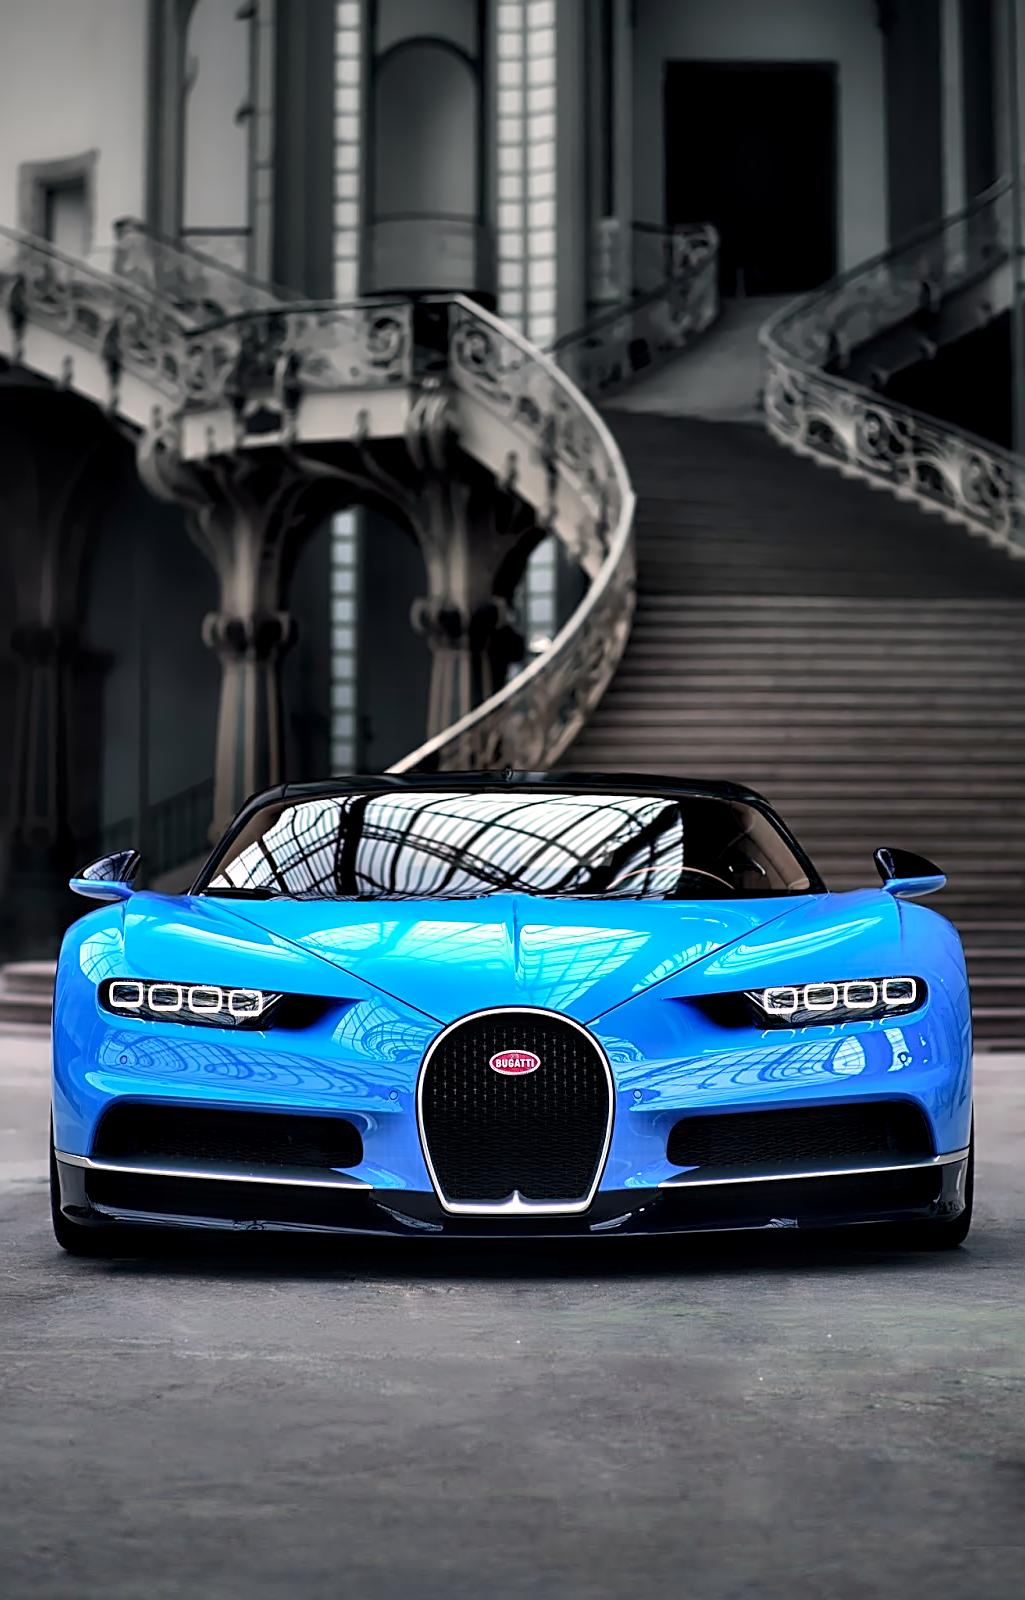 Bugatti Chiron (2016) #bugattichiron #bugatti #chiron #sportcars #supercars #alekar